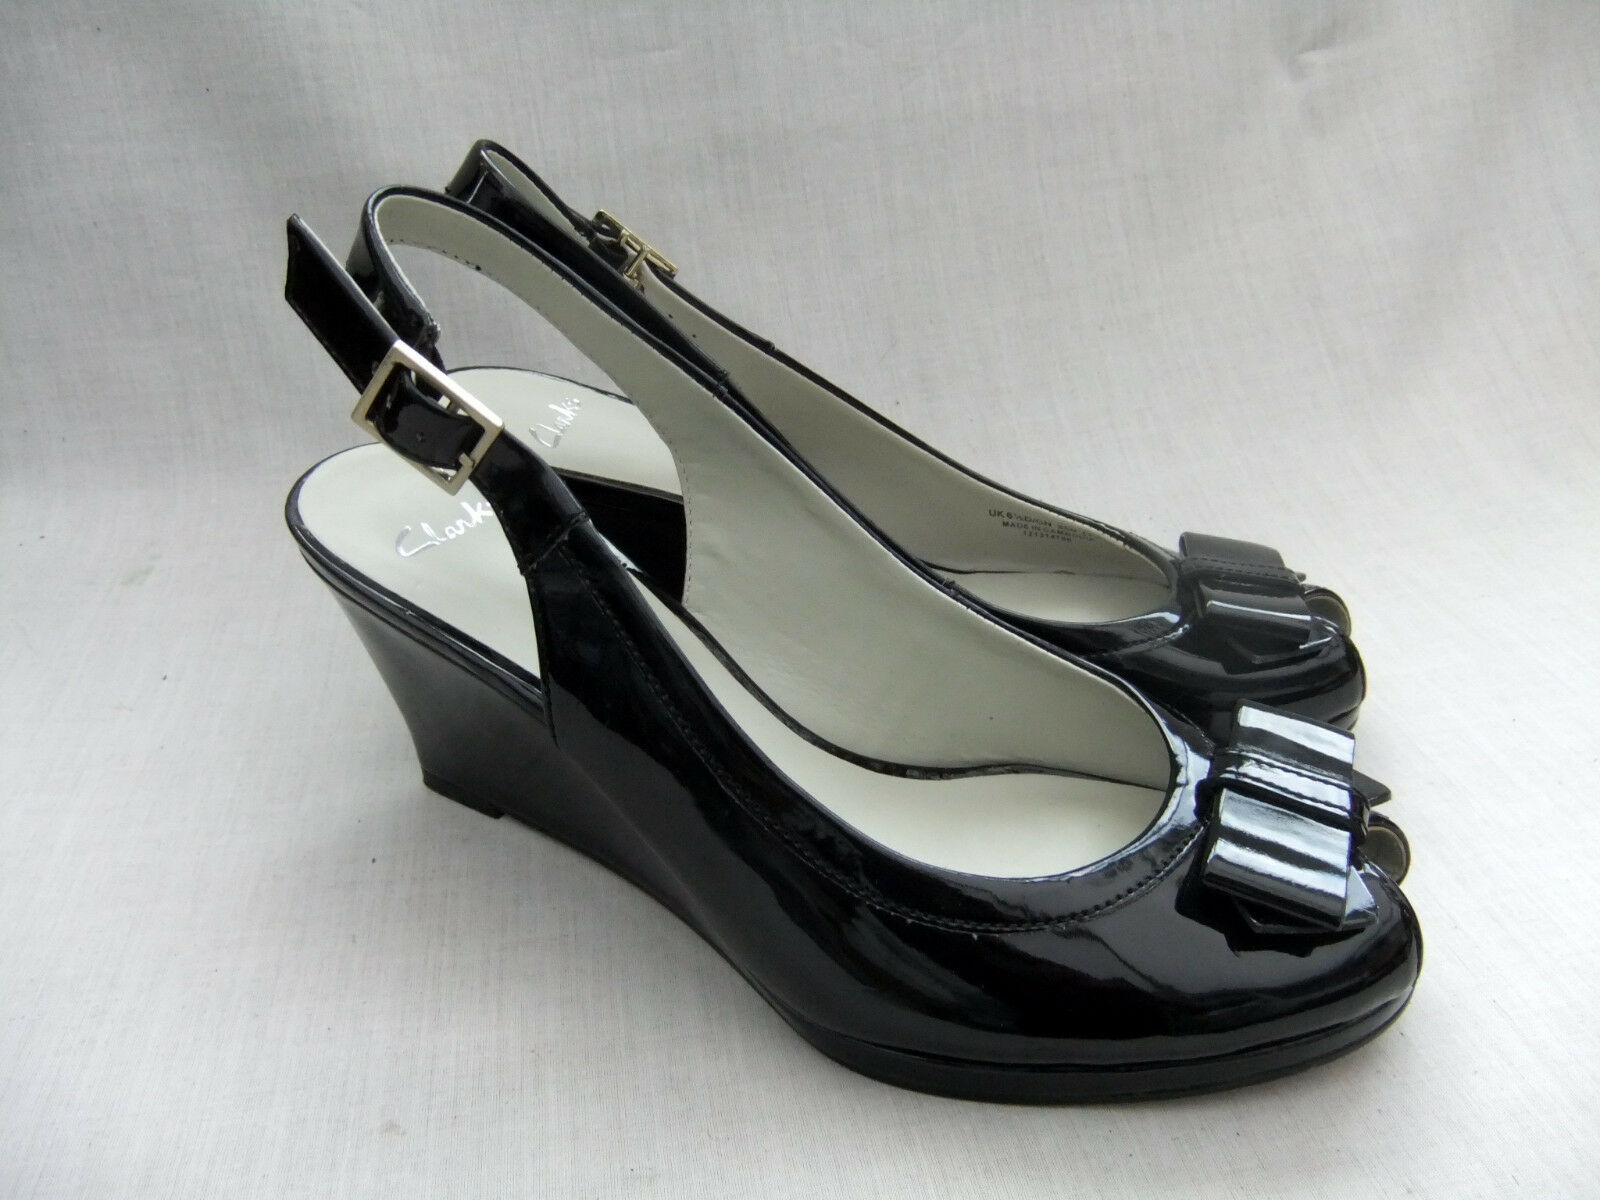 NEW CLARKS SKYLA BAHAMA femmes noir PATENT WEDGE SANDALS chaussures